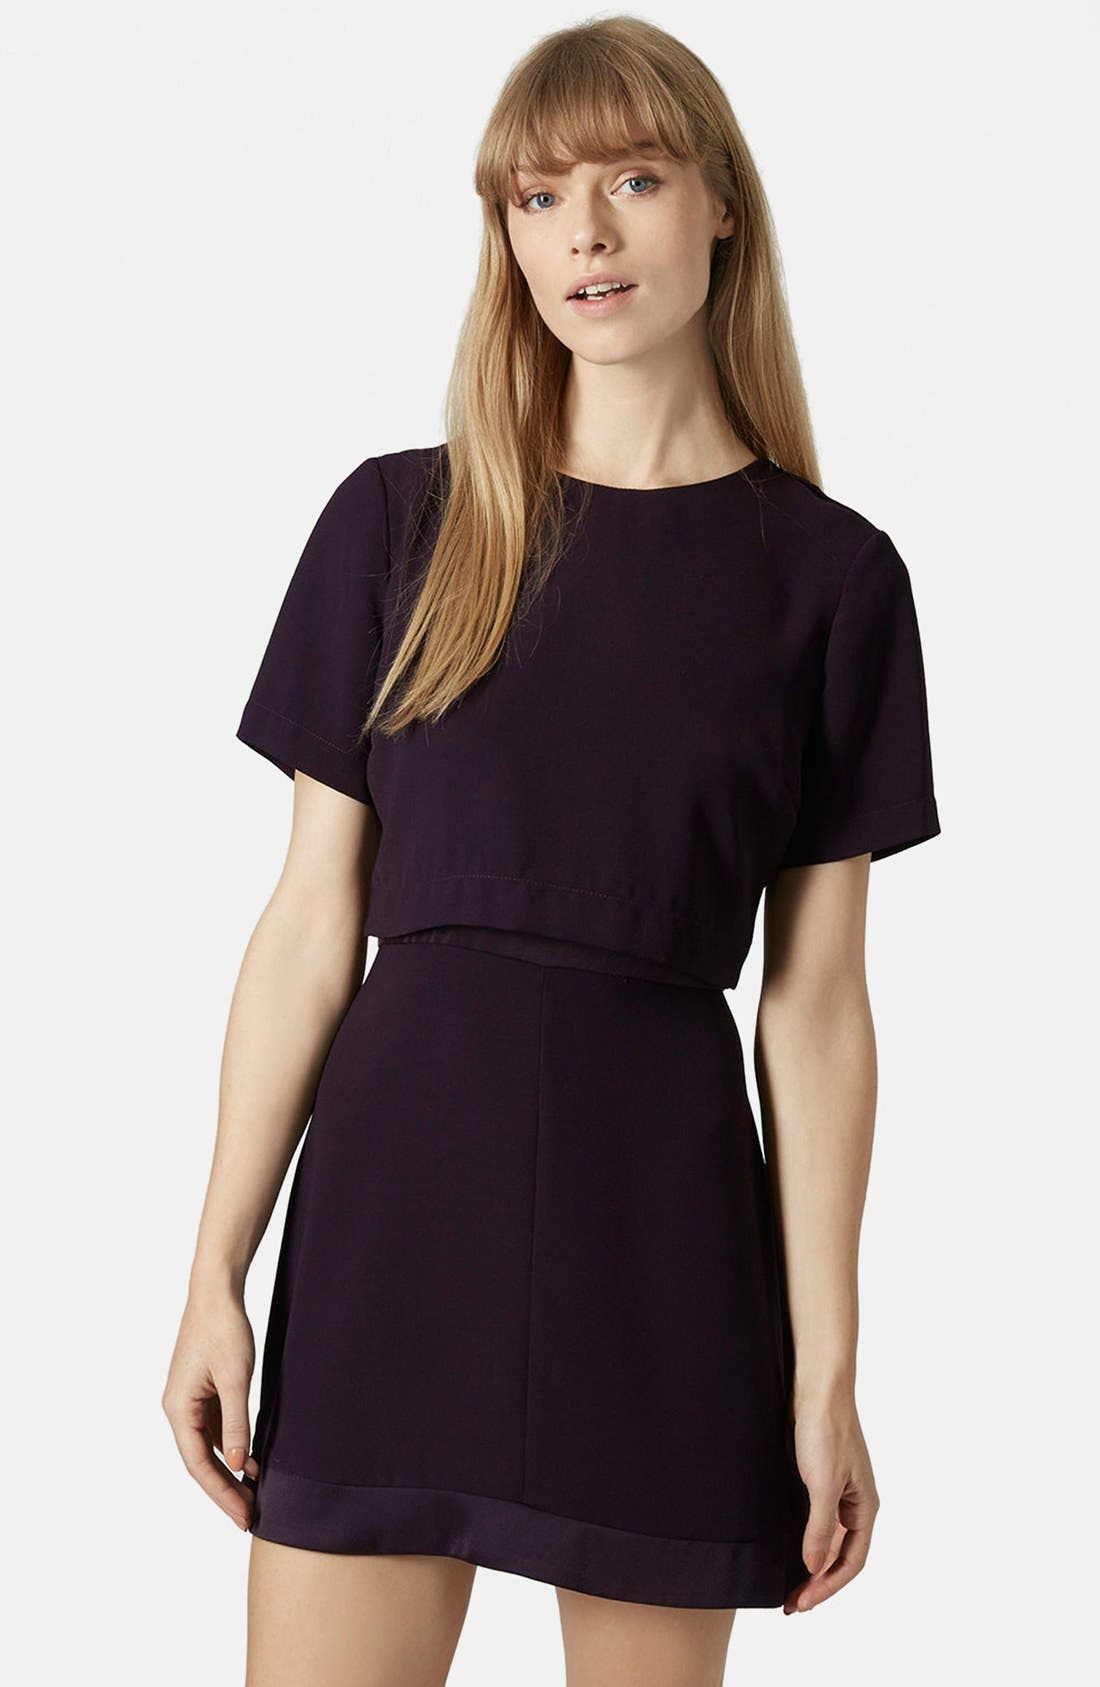 Alternate Image 1 Selected - Topshop Satin Trim Overlay Dress